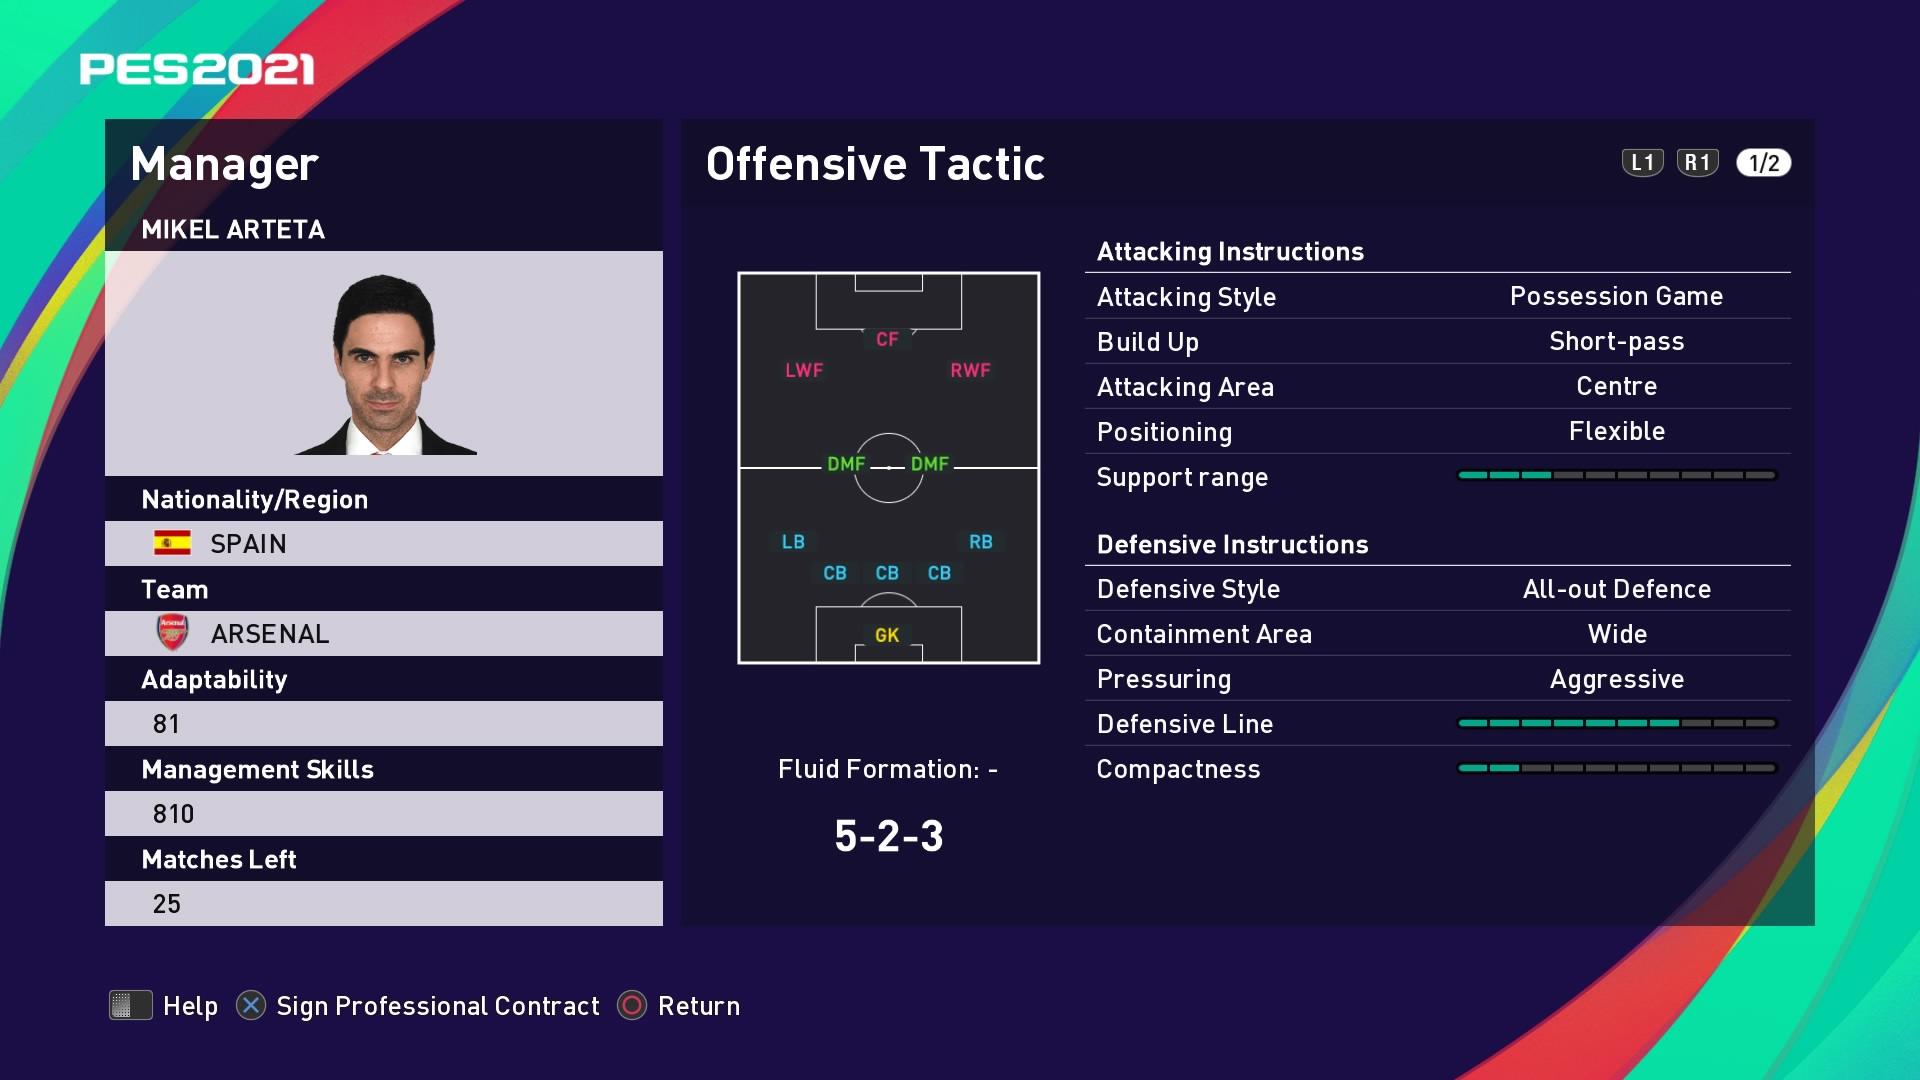 Mikel Arteta Offensive Tactic in PES 2021 myClub